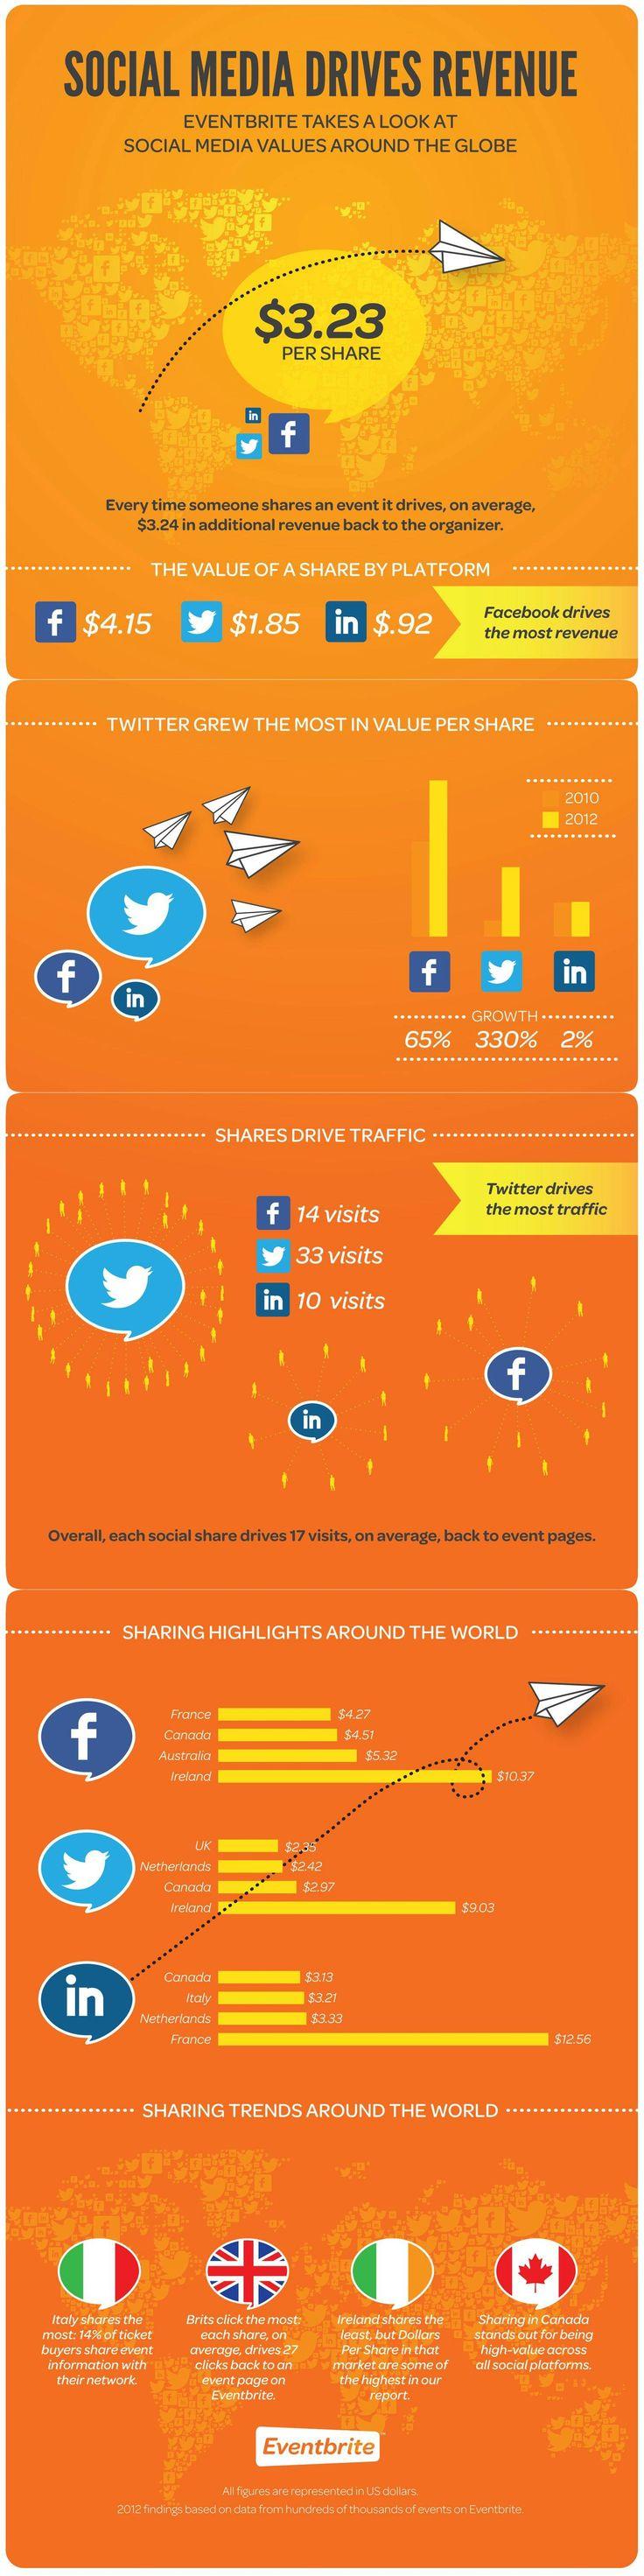 Infographic: Social media values around the globe